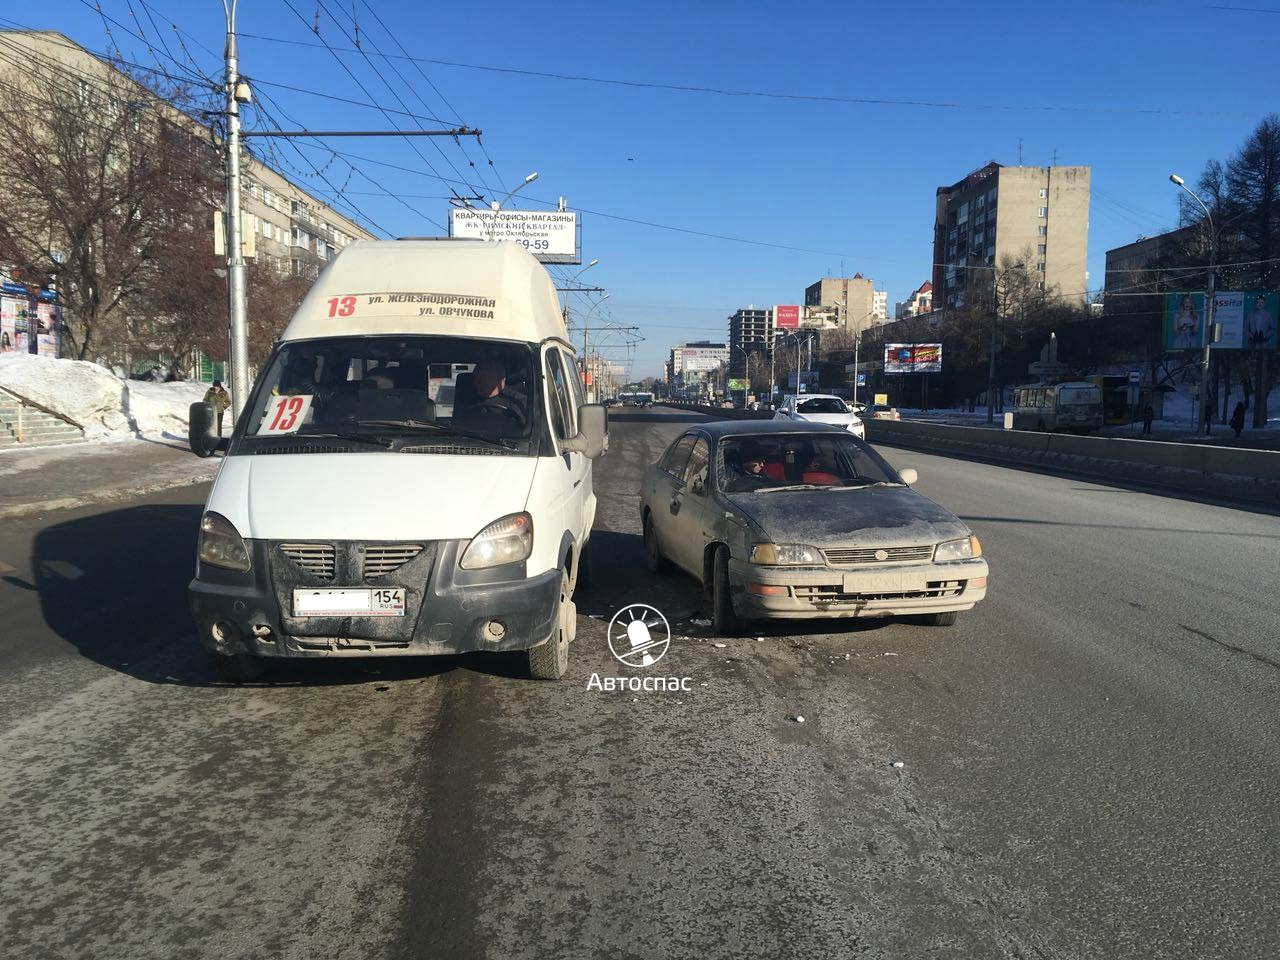 В Новосибирске произошло ДТП маршрутки №13 с пассажирами и Toyota Corona